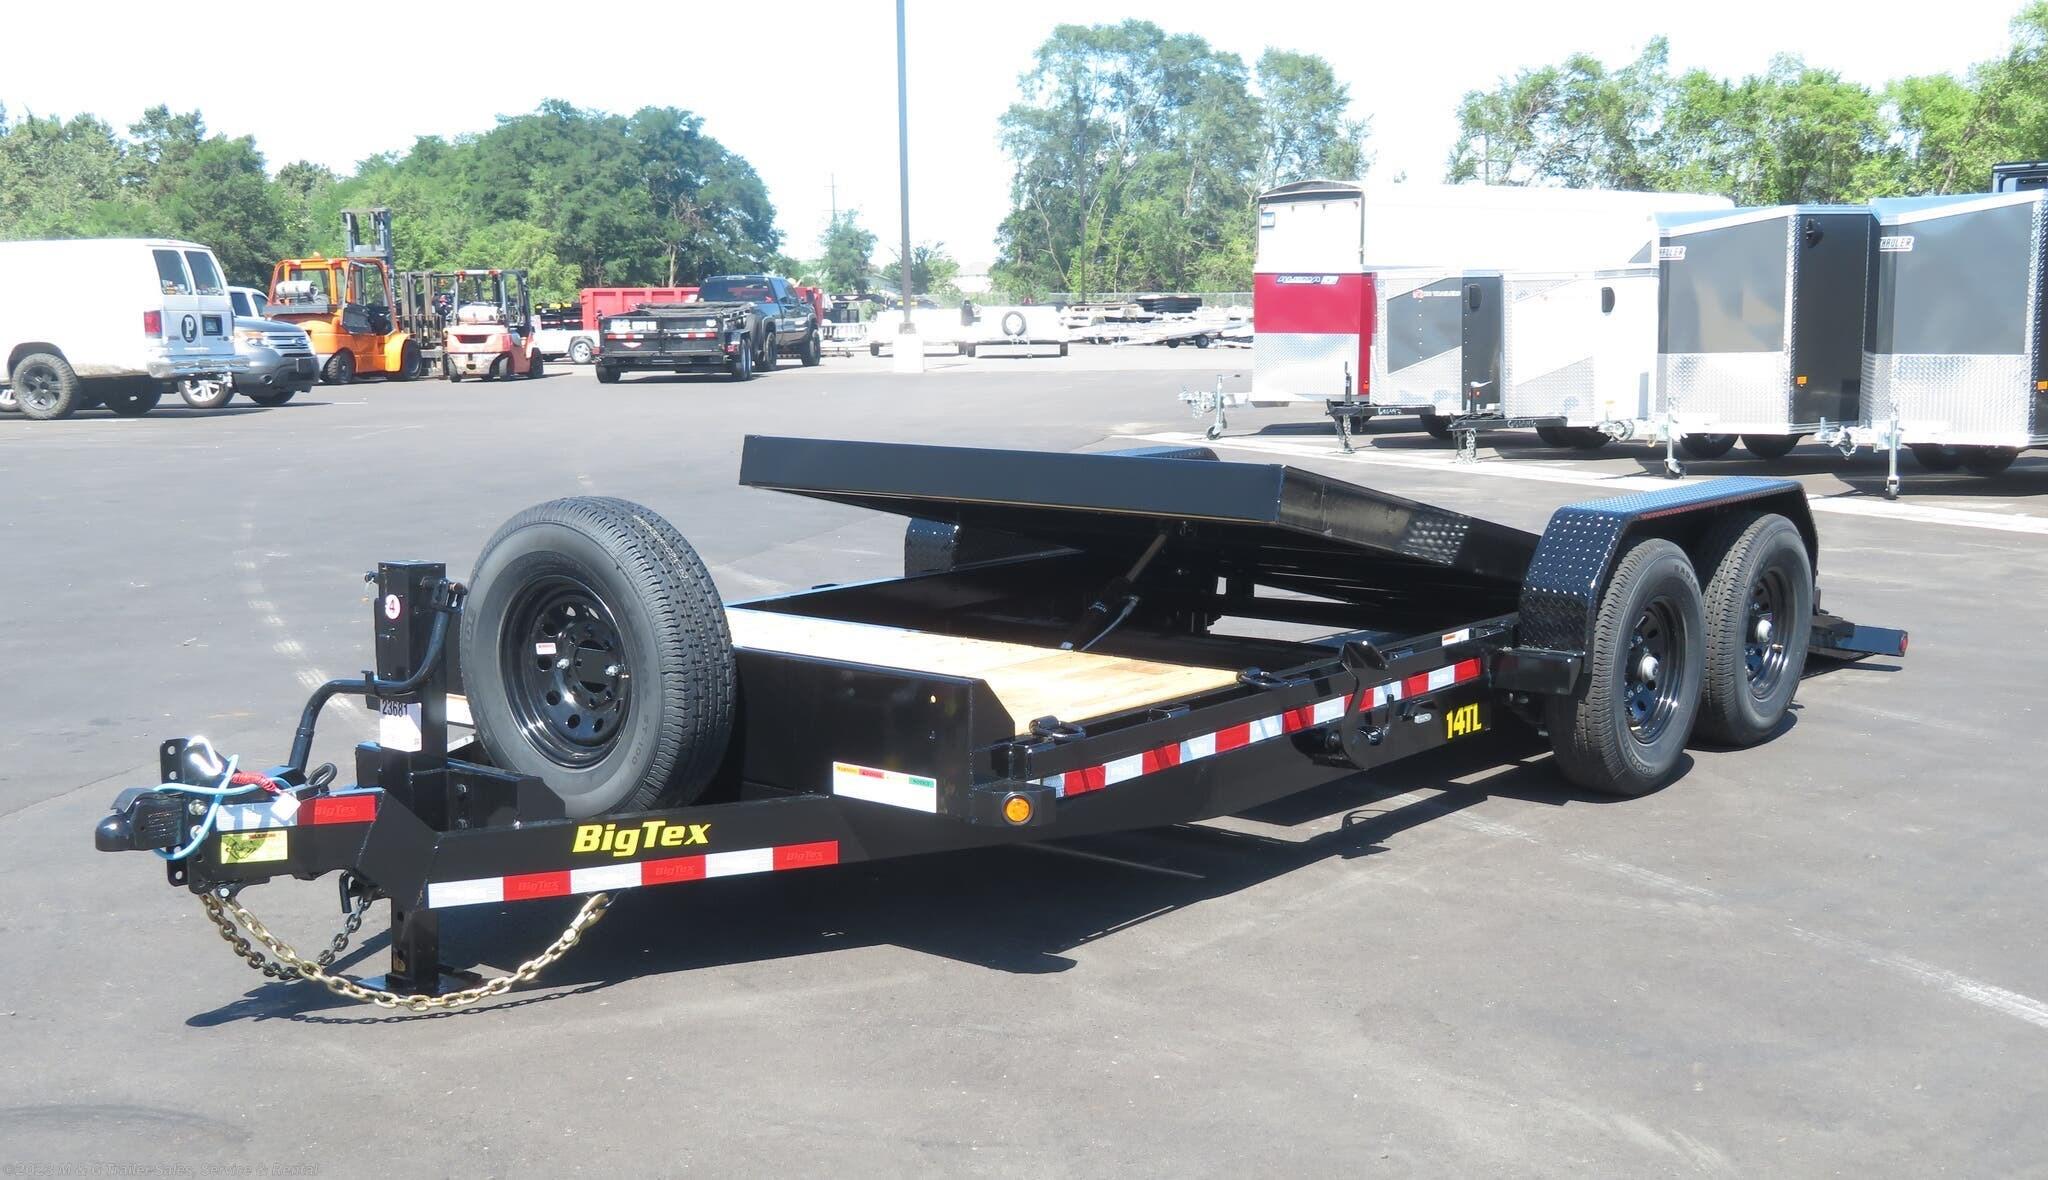 2022 Big Tex 20' Tilt Bed - 4' Stationary Deck - Stock #132070